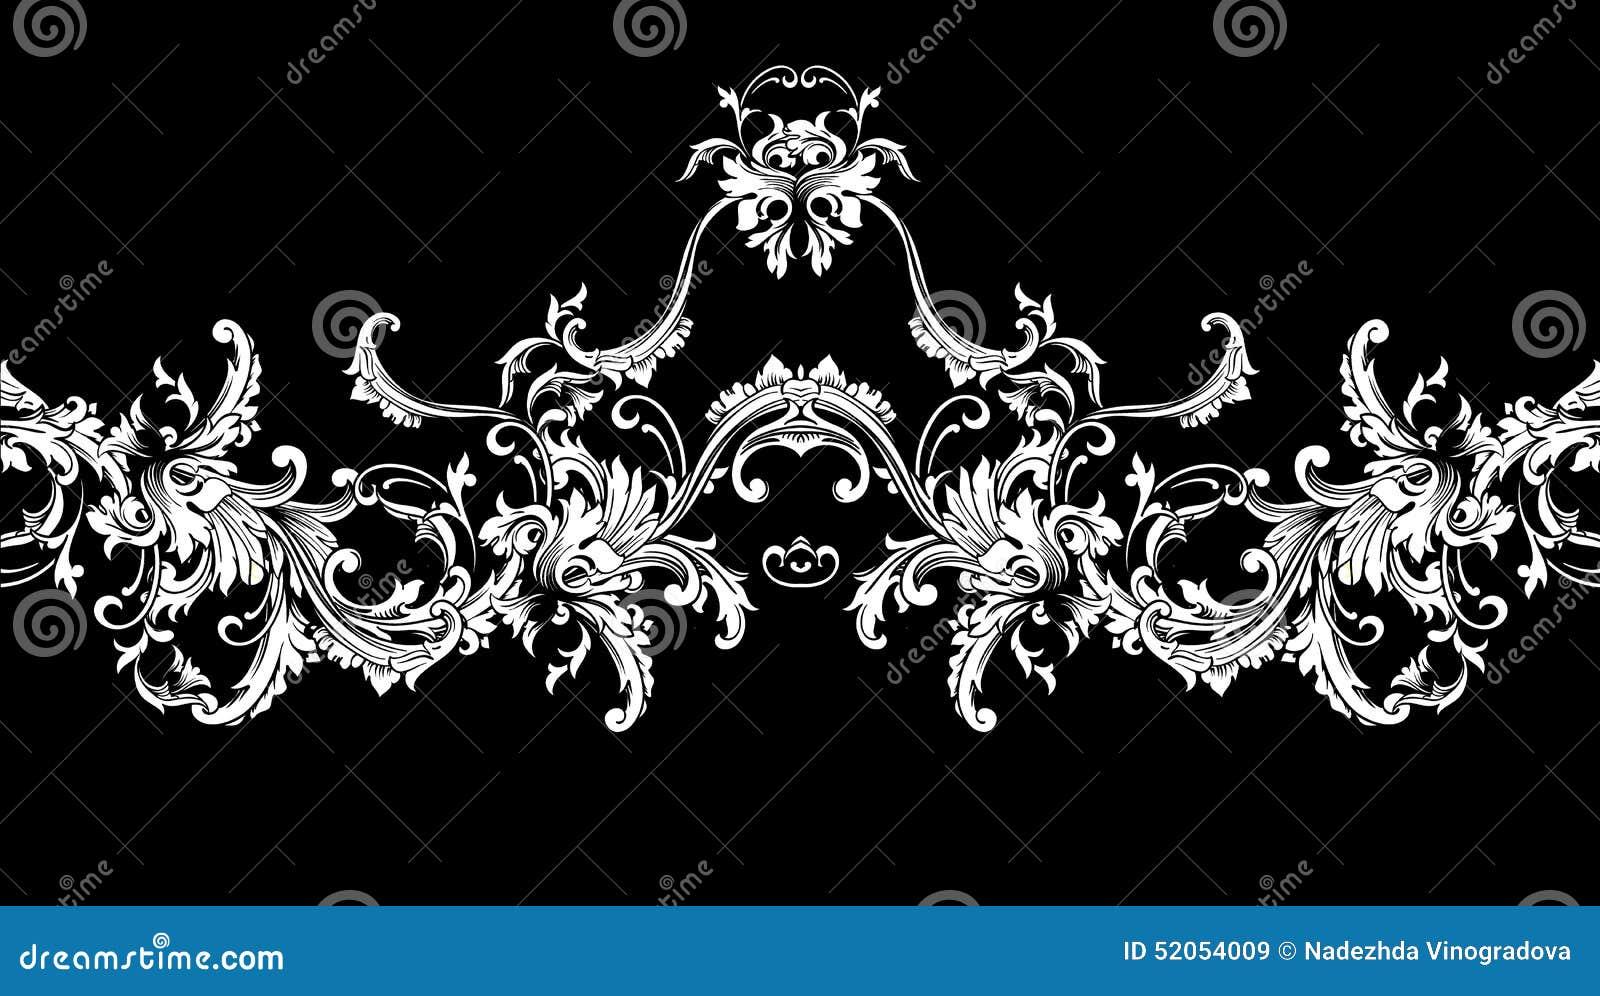 Dekorative Grenze Rahmen Barockes Muster Vektor Nahtlos Vektor